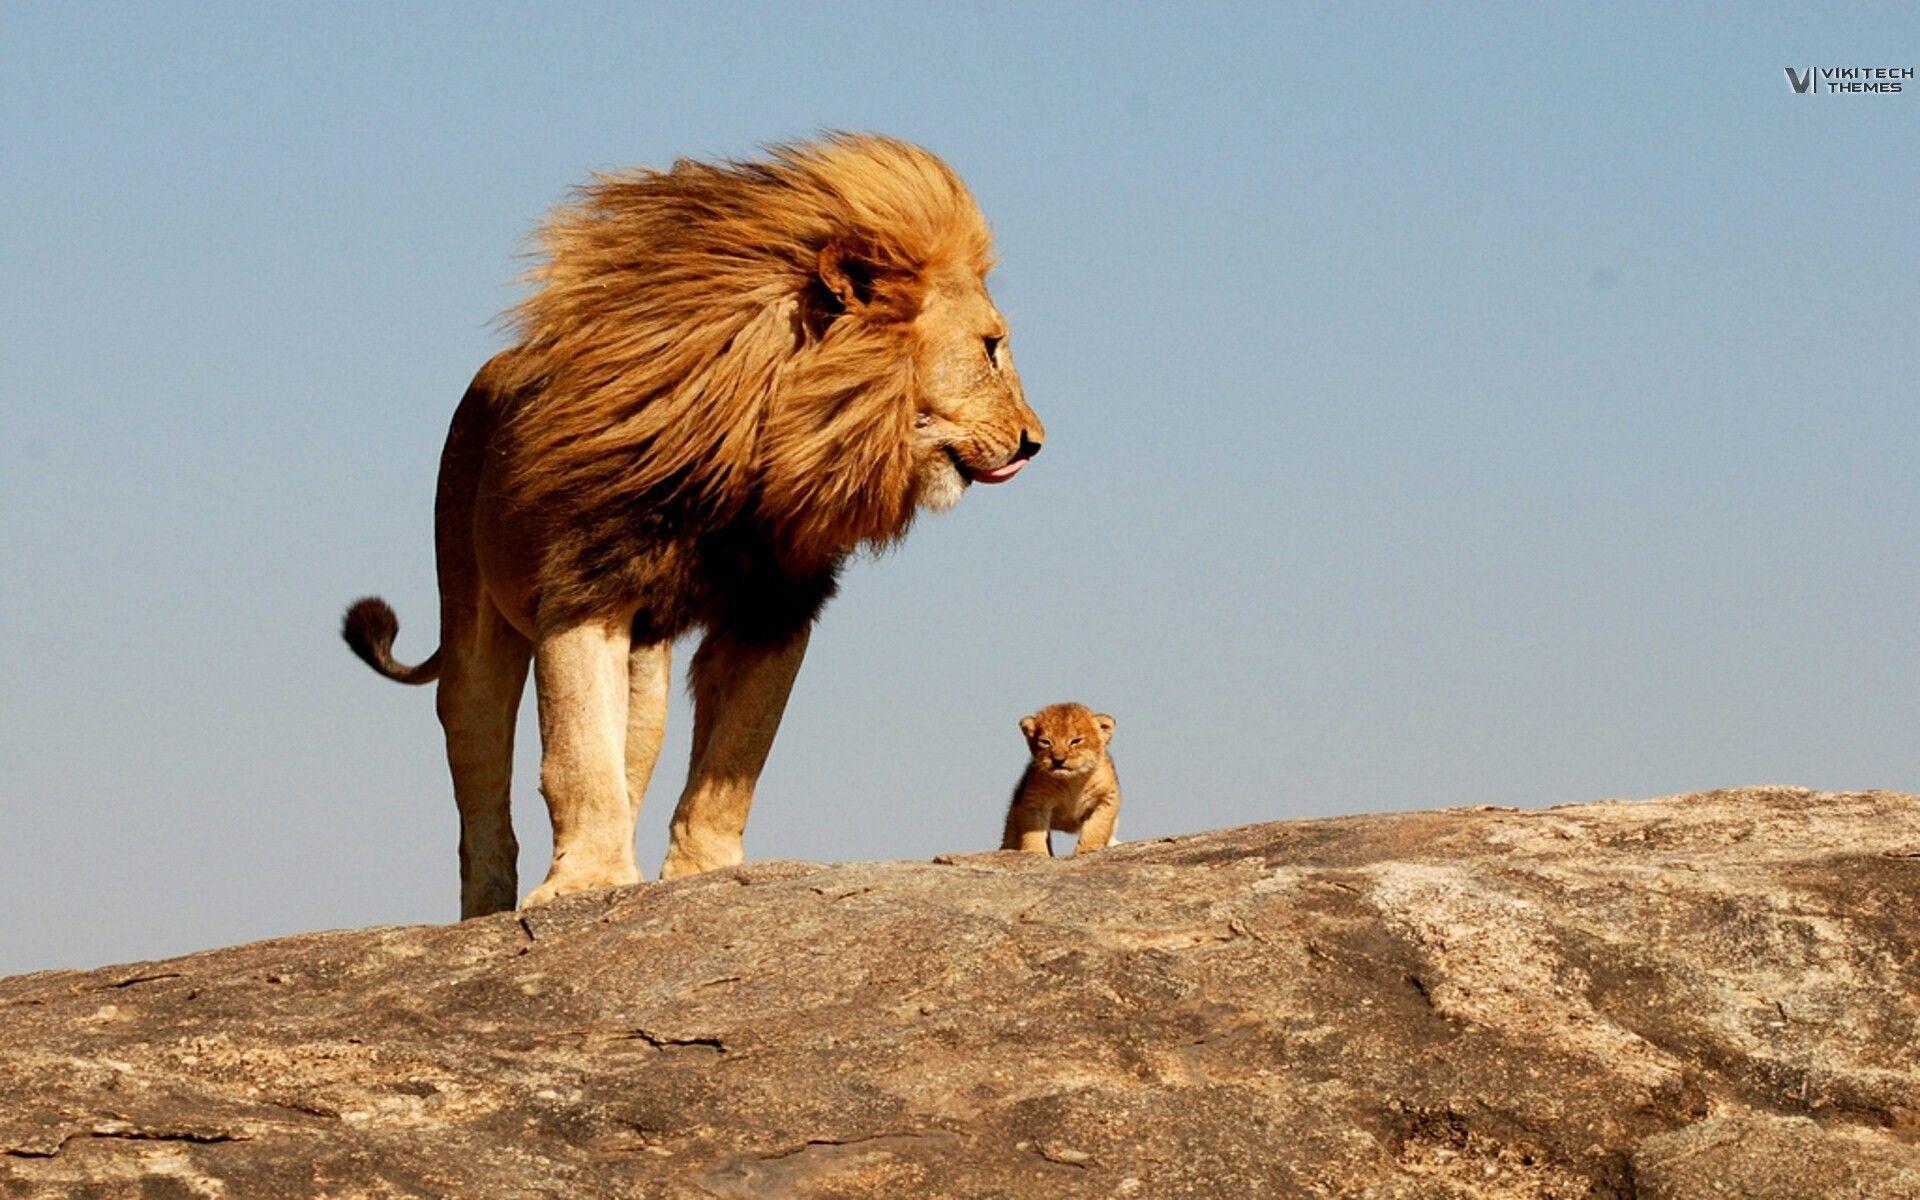 Lion, king, safari, savage wallpapers and images - wallpapers ...